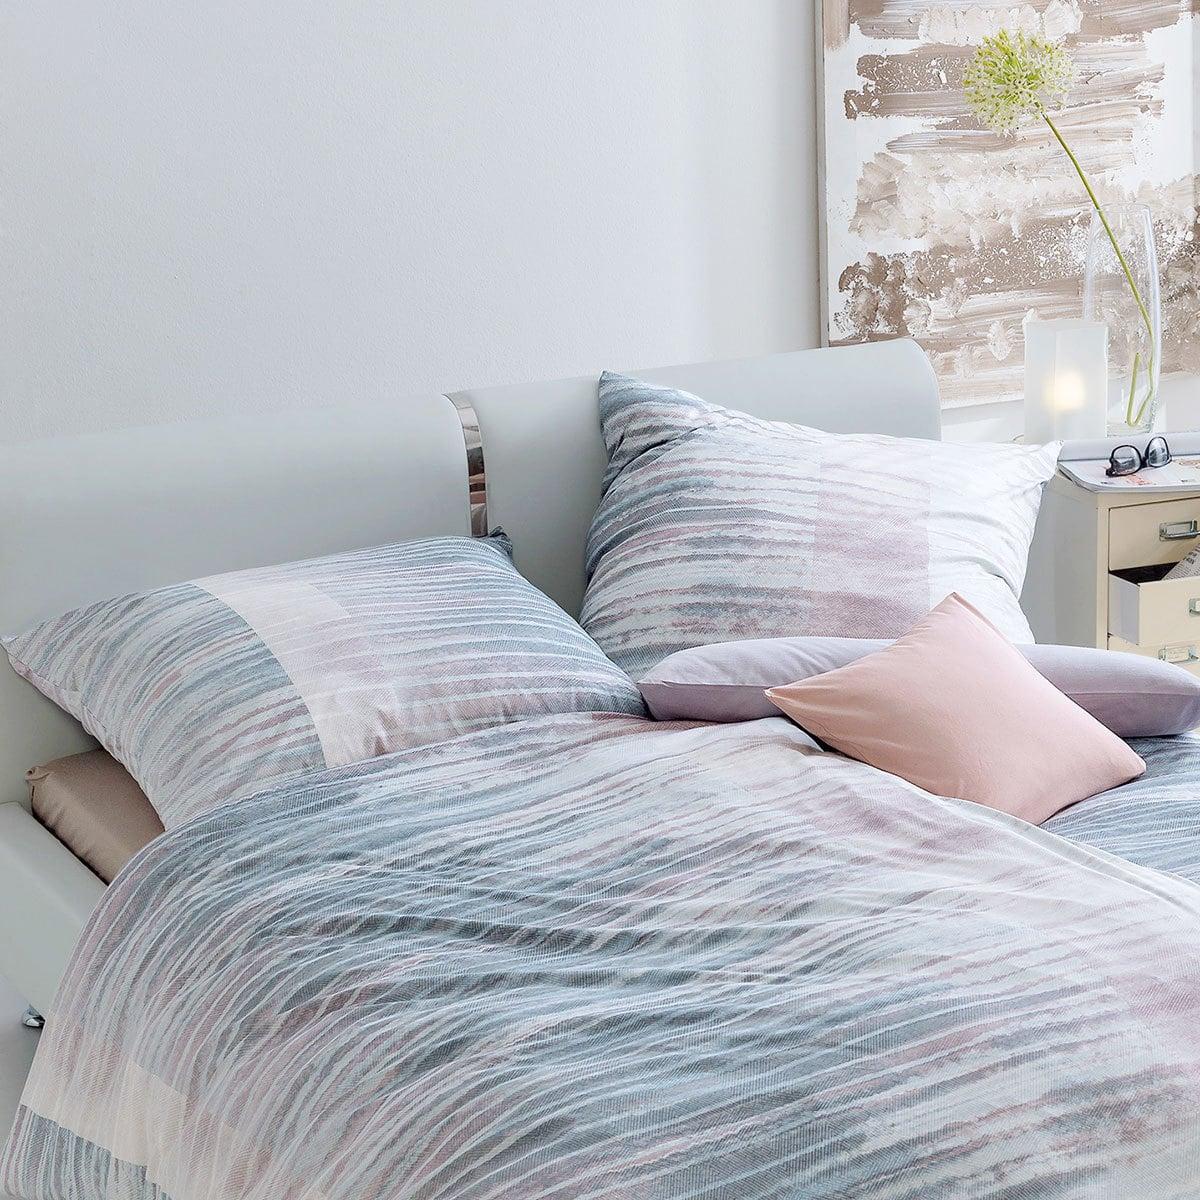 estella mako interlock jersey bettw sche marlon rosenholz. Black Bedroom Furniture Sets. Home Design Ideas